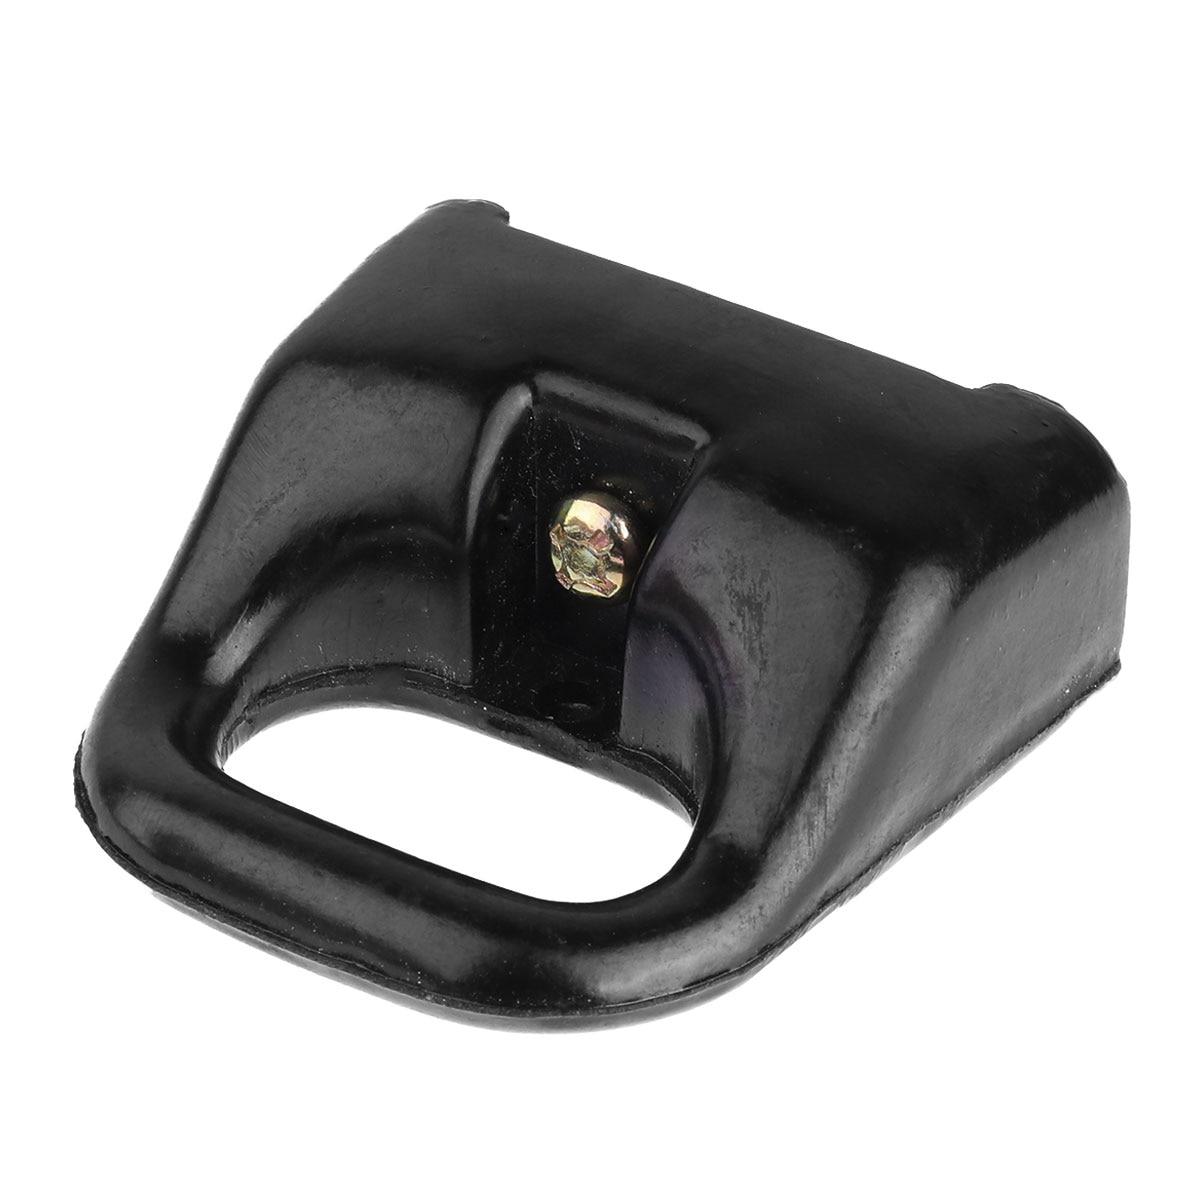 2Pcs Black Bakelite Metal Pressure Pan Cooker Steamer Sauce Pot Replacement Short Side Handle for Home Tools|Cookware Handles & Knobs|   - AliExpress